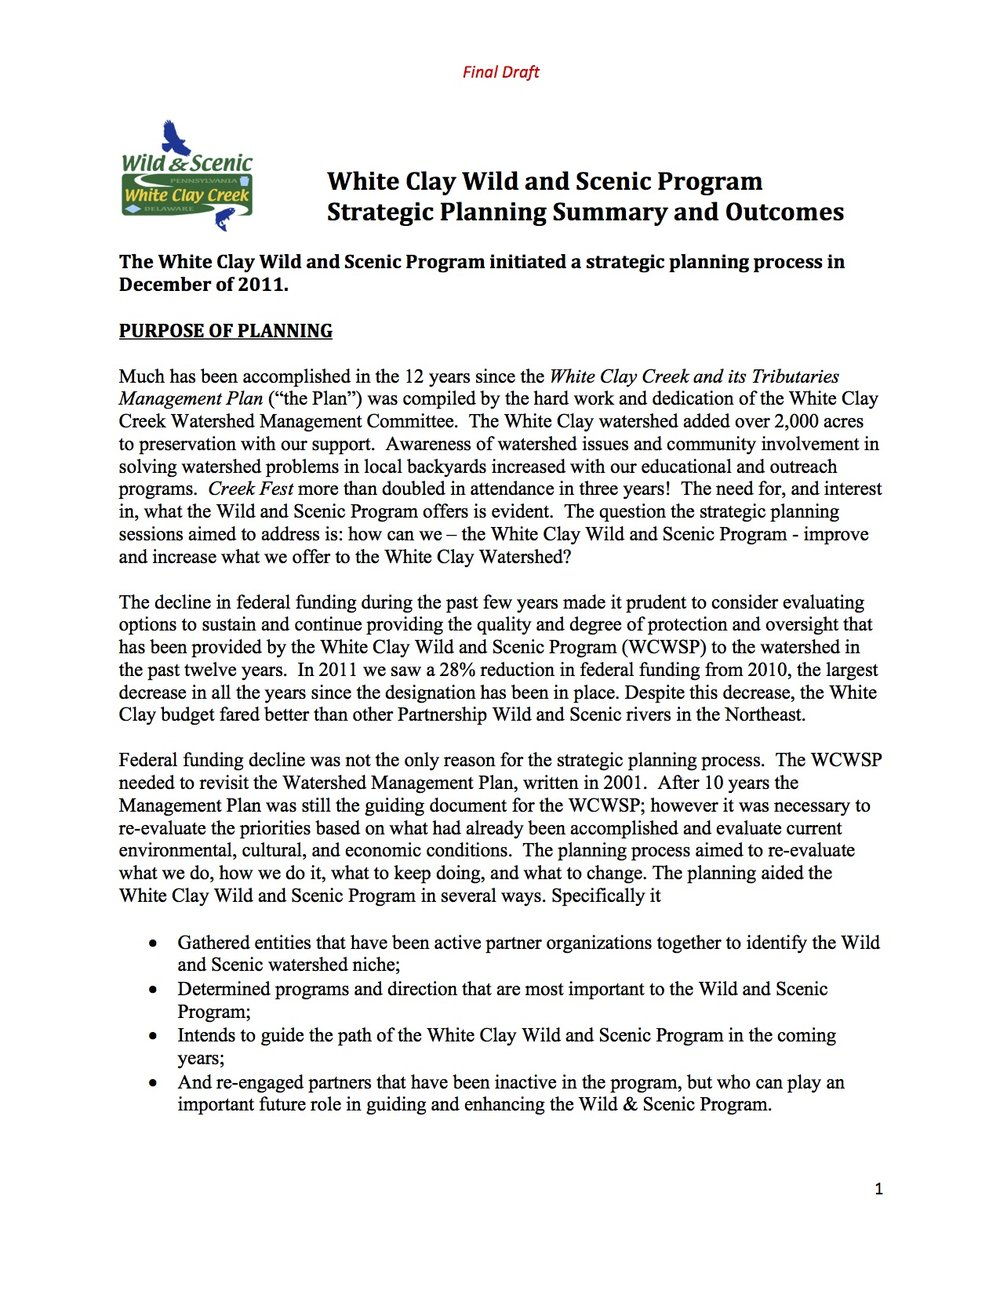 WCWS Strategic PlanFinal Draft 2-21-13